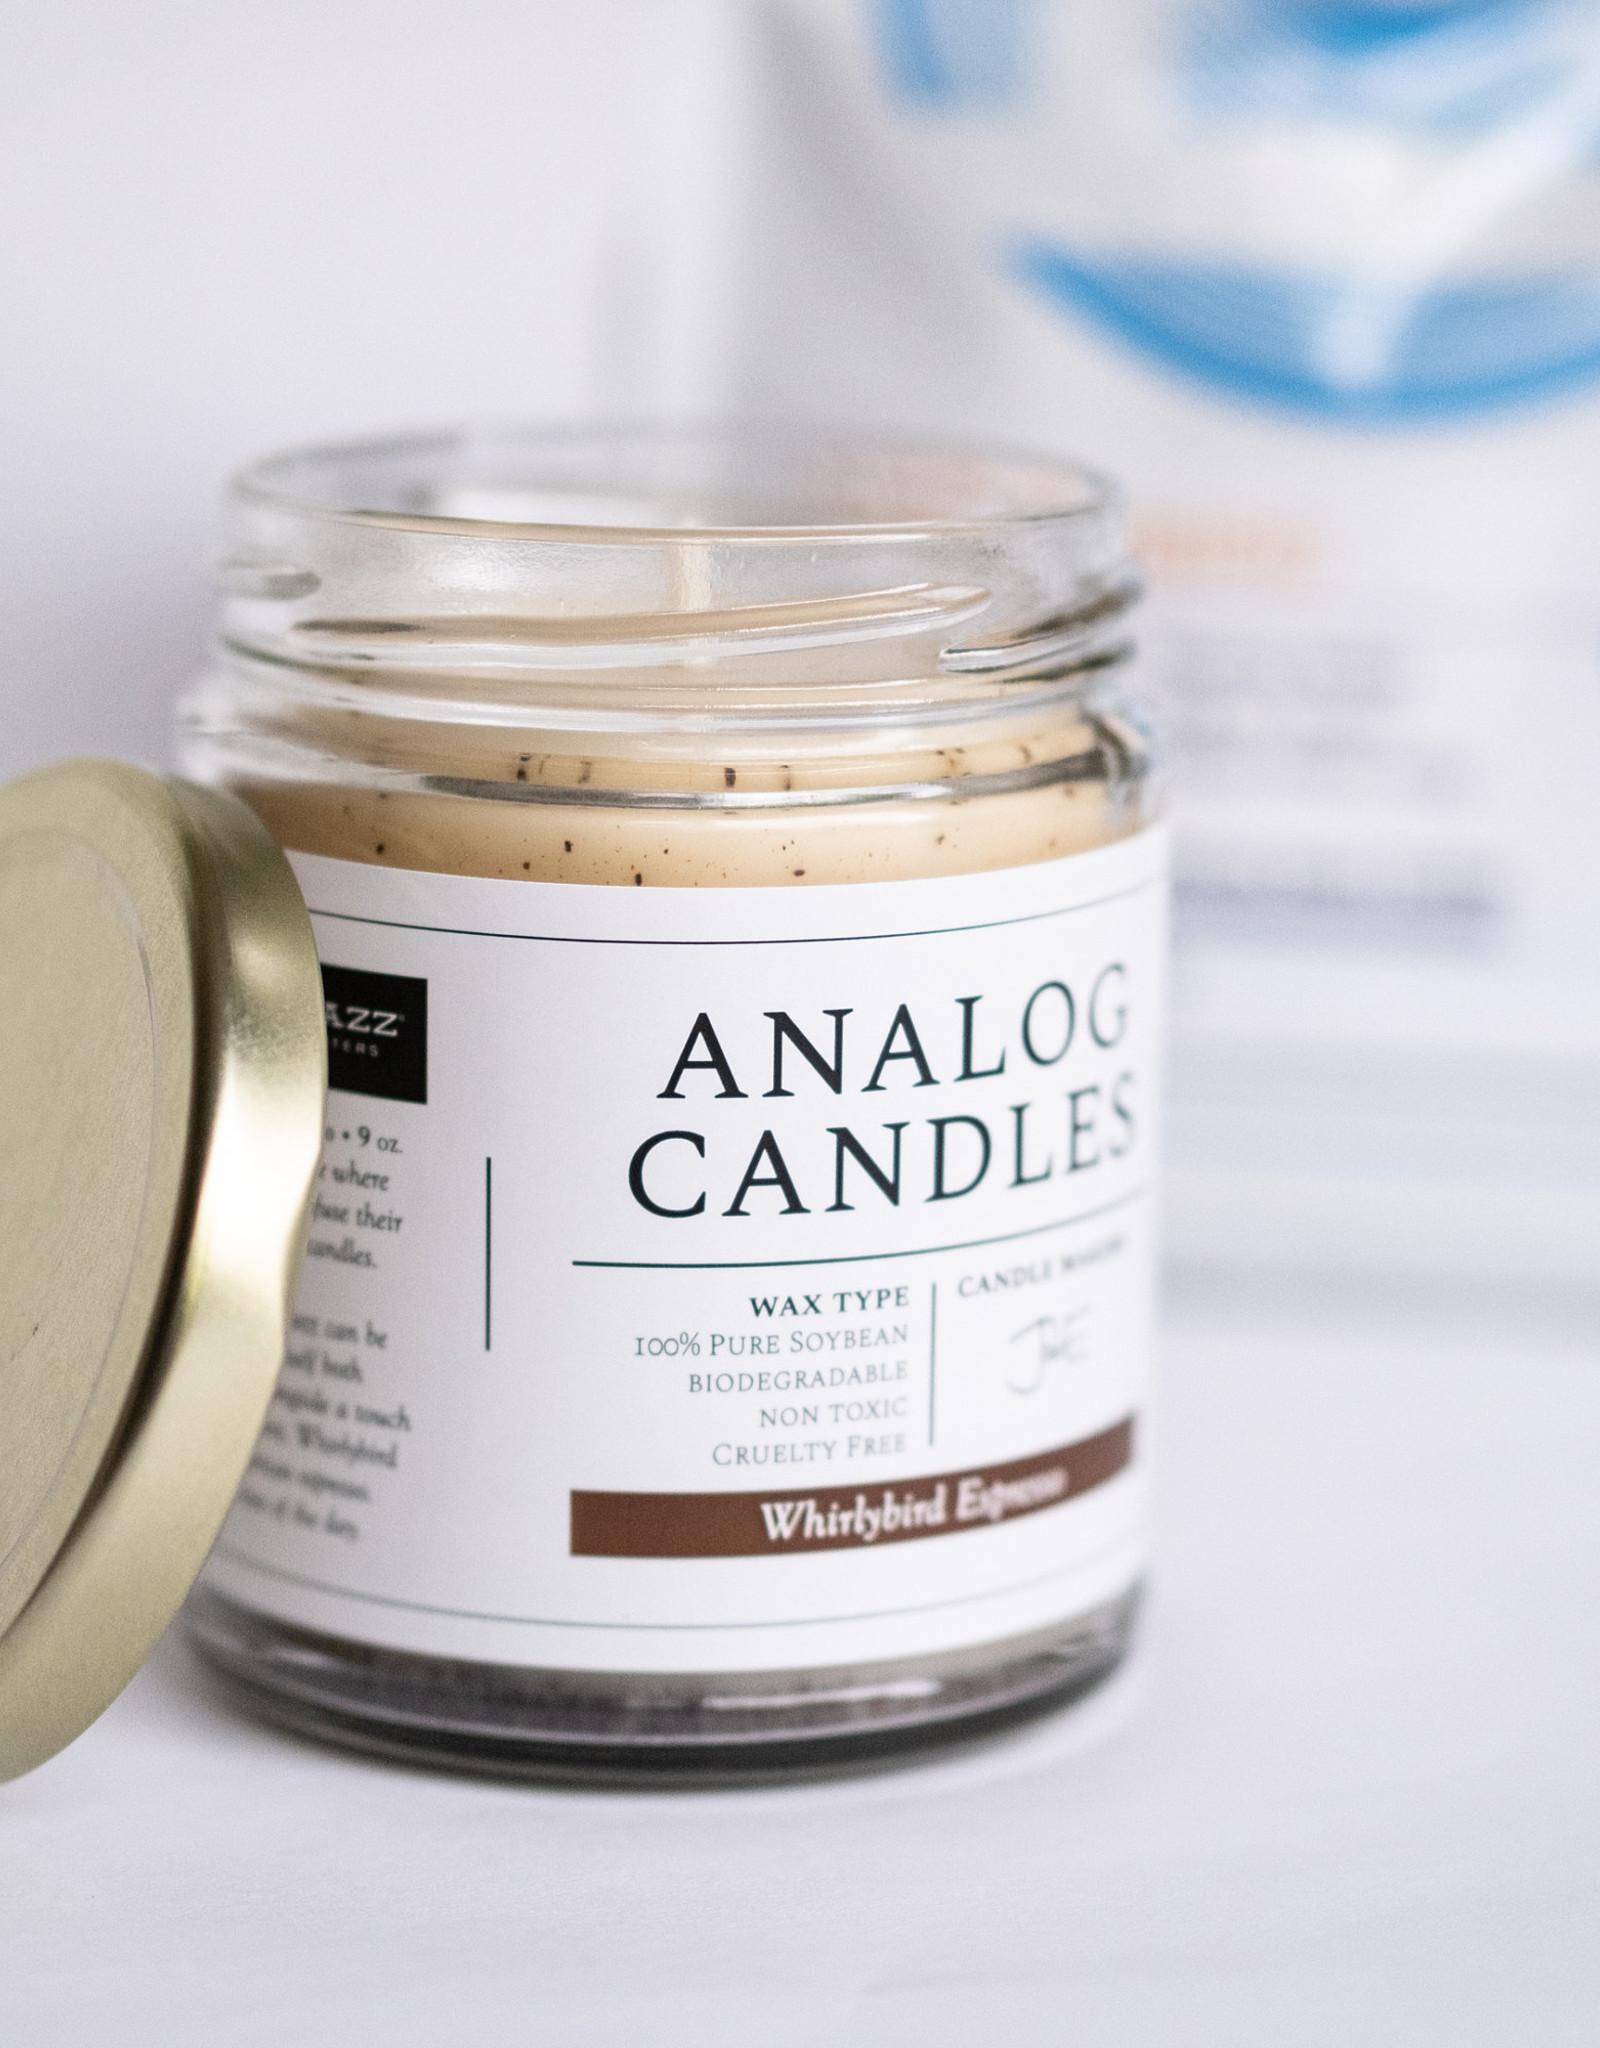 Analog Candles Soy Candles by Analog Candles